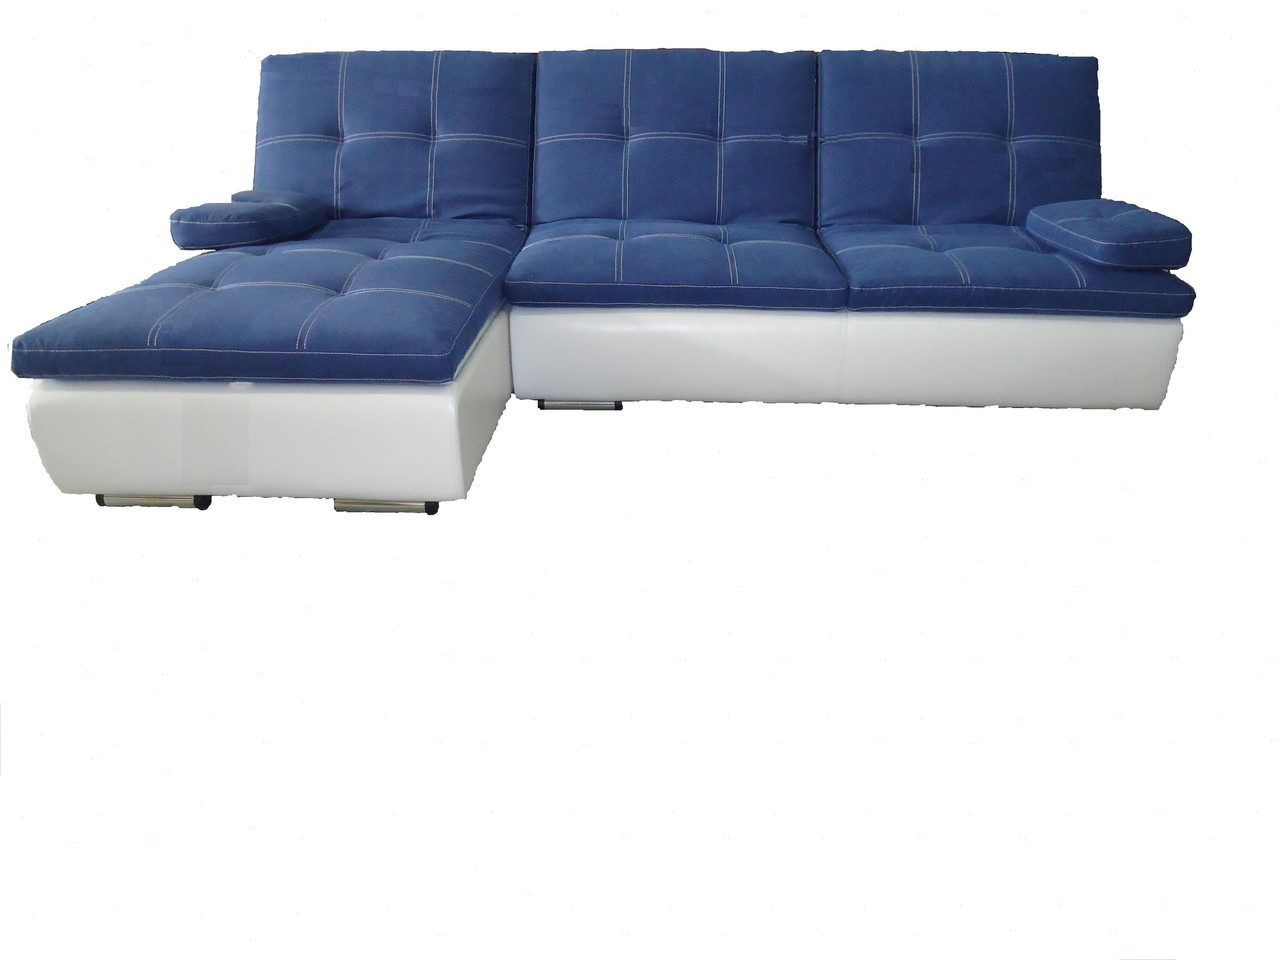 диван лаунж цена 750 купить в чернигове Promua Id248261913